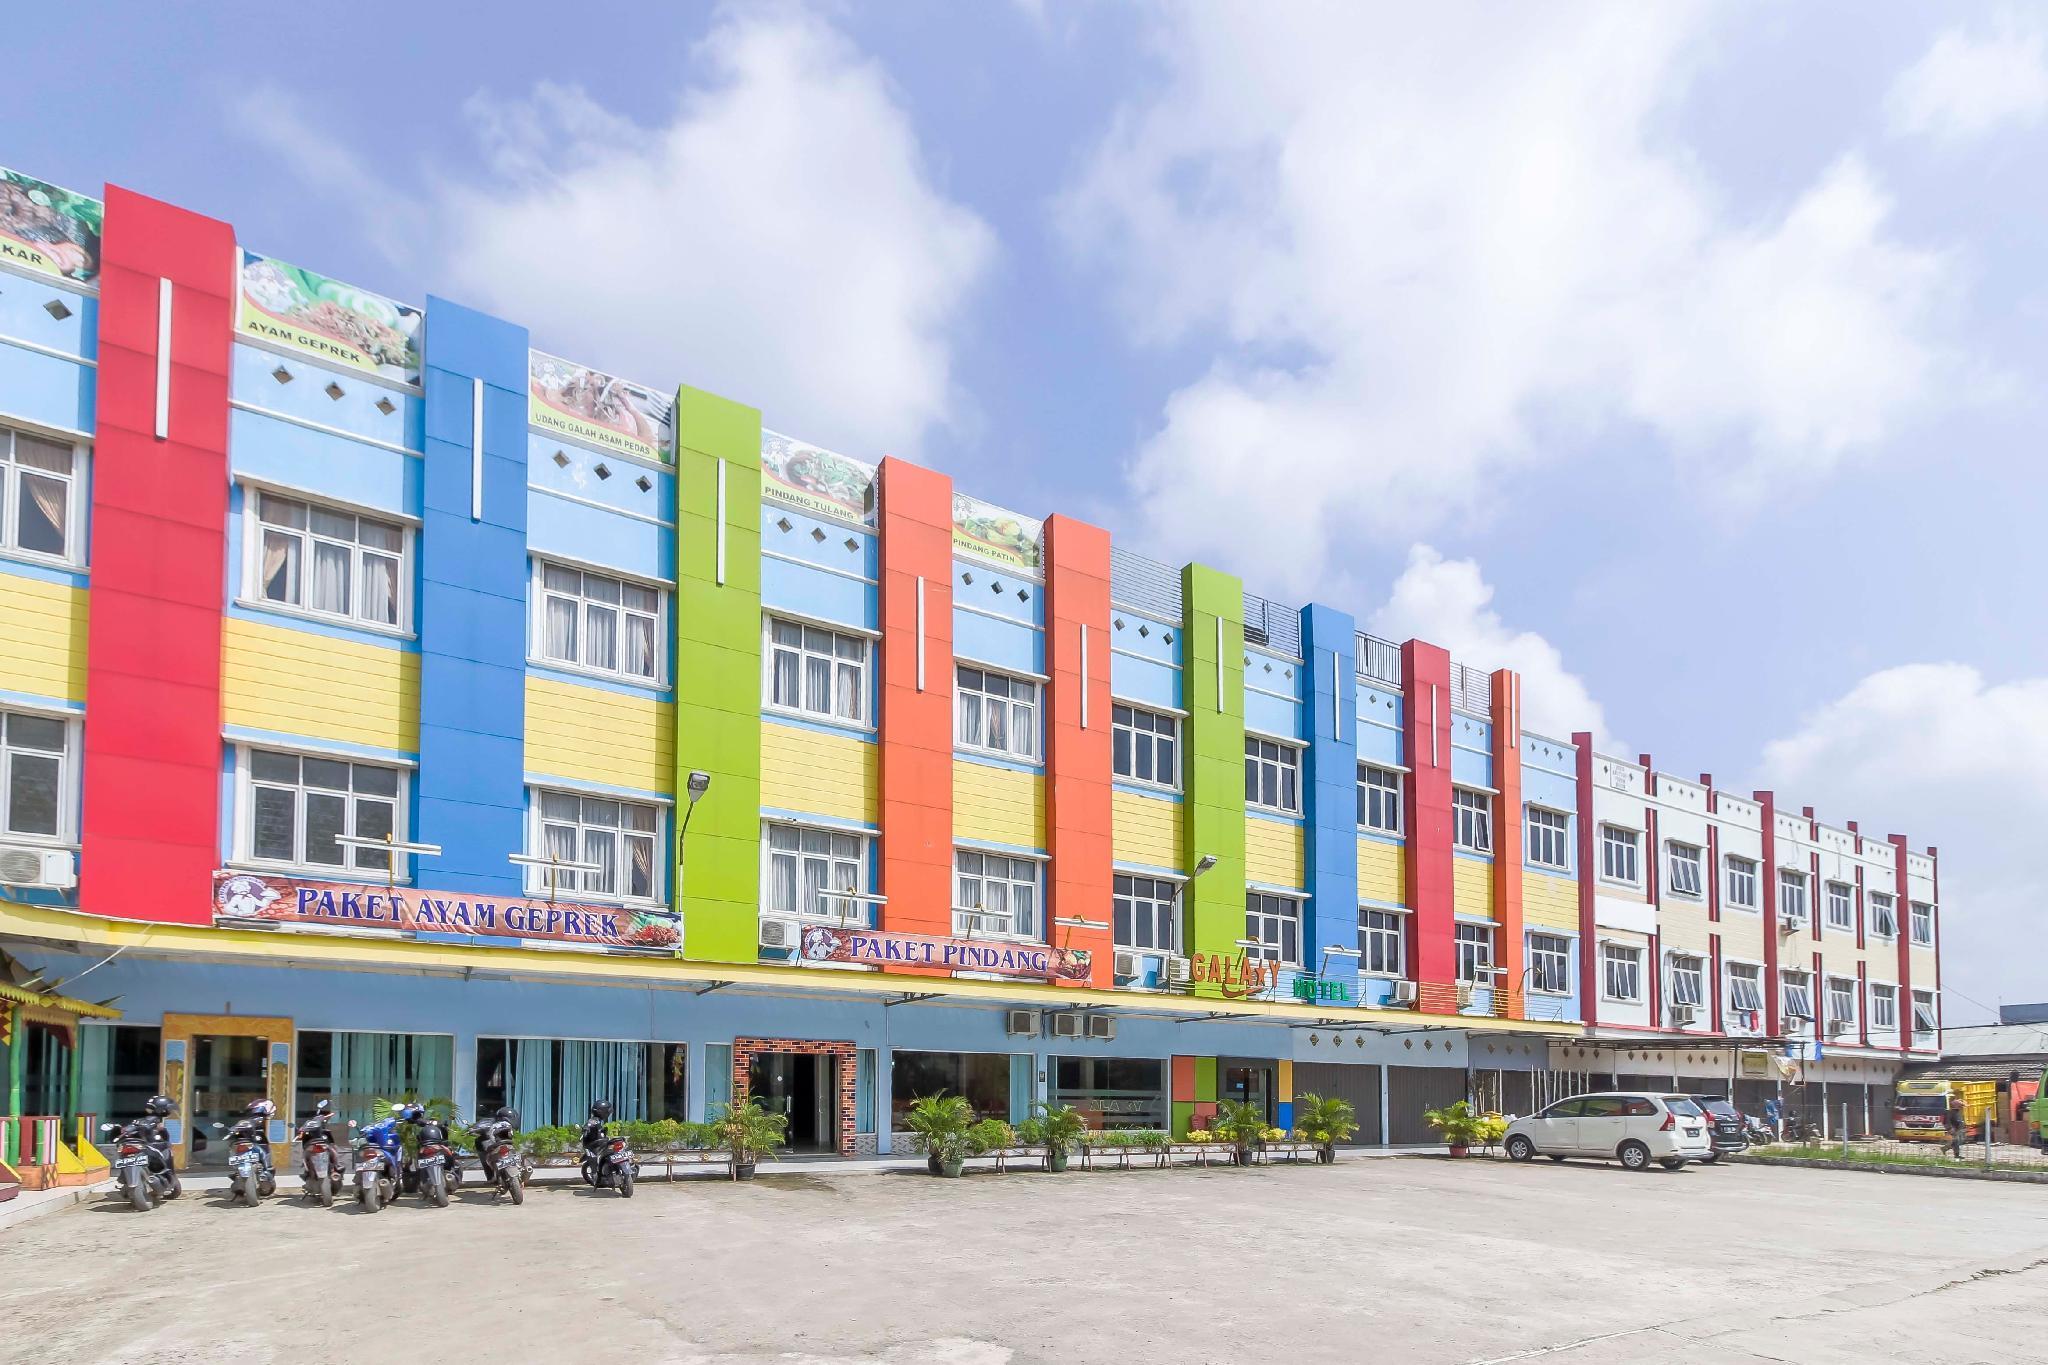 Hotel Galaxy, Palembang